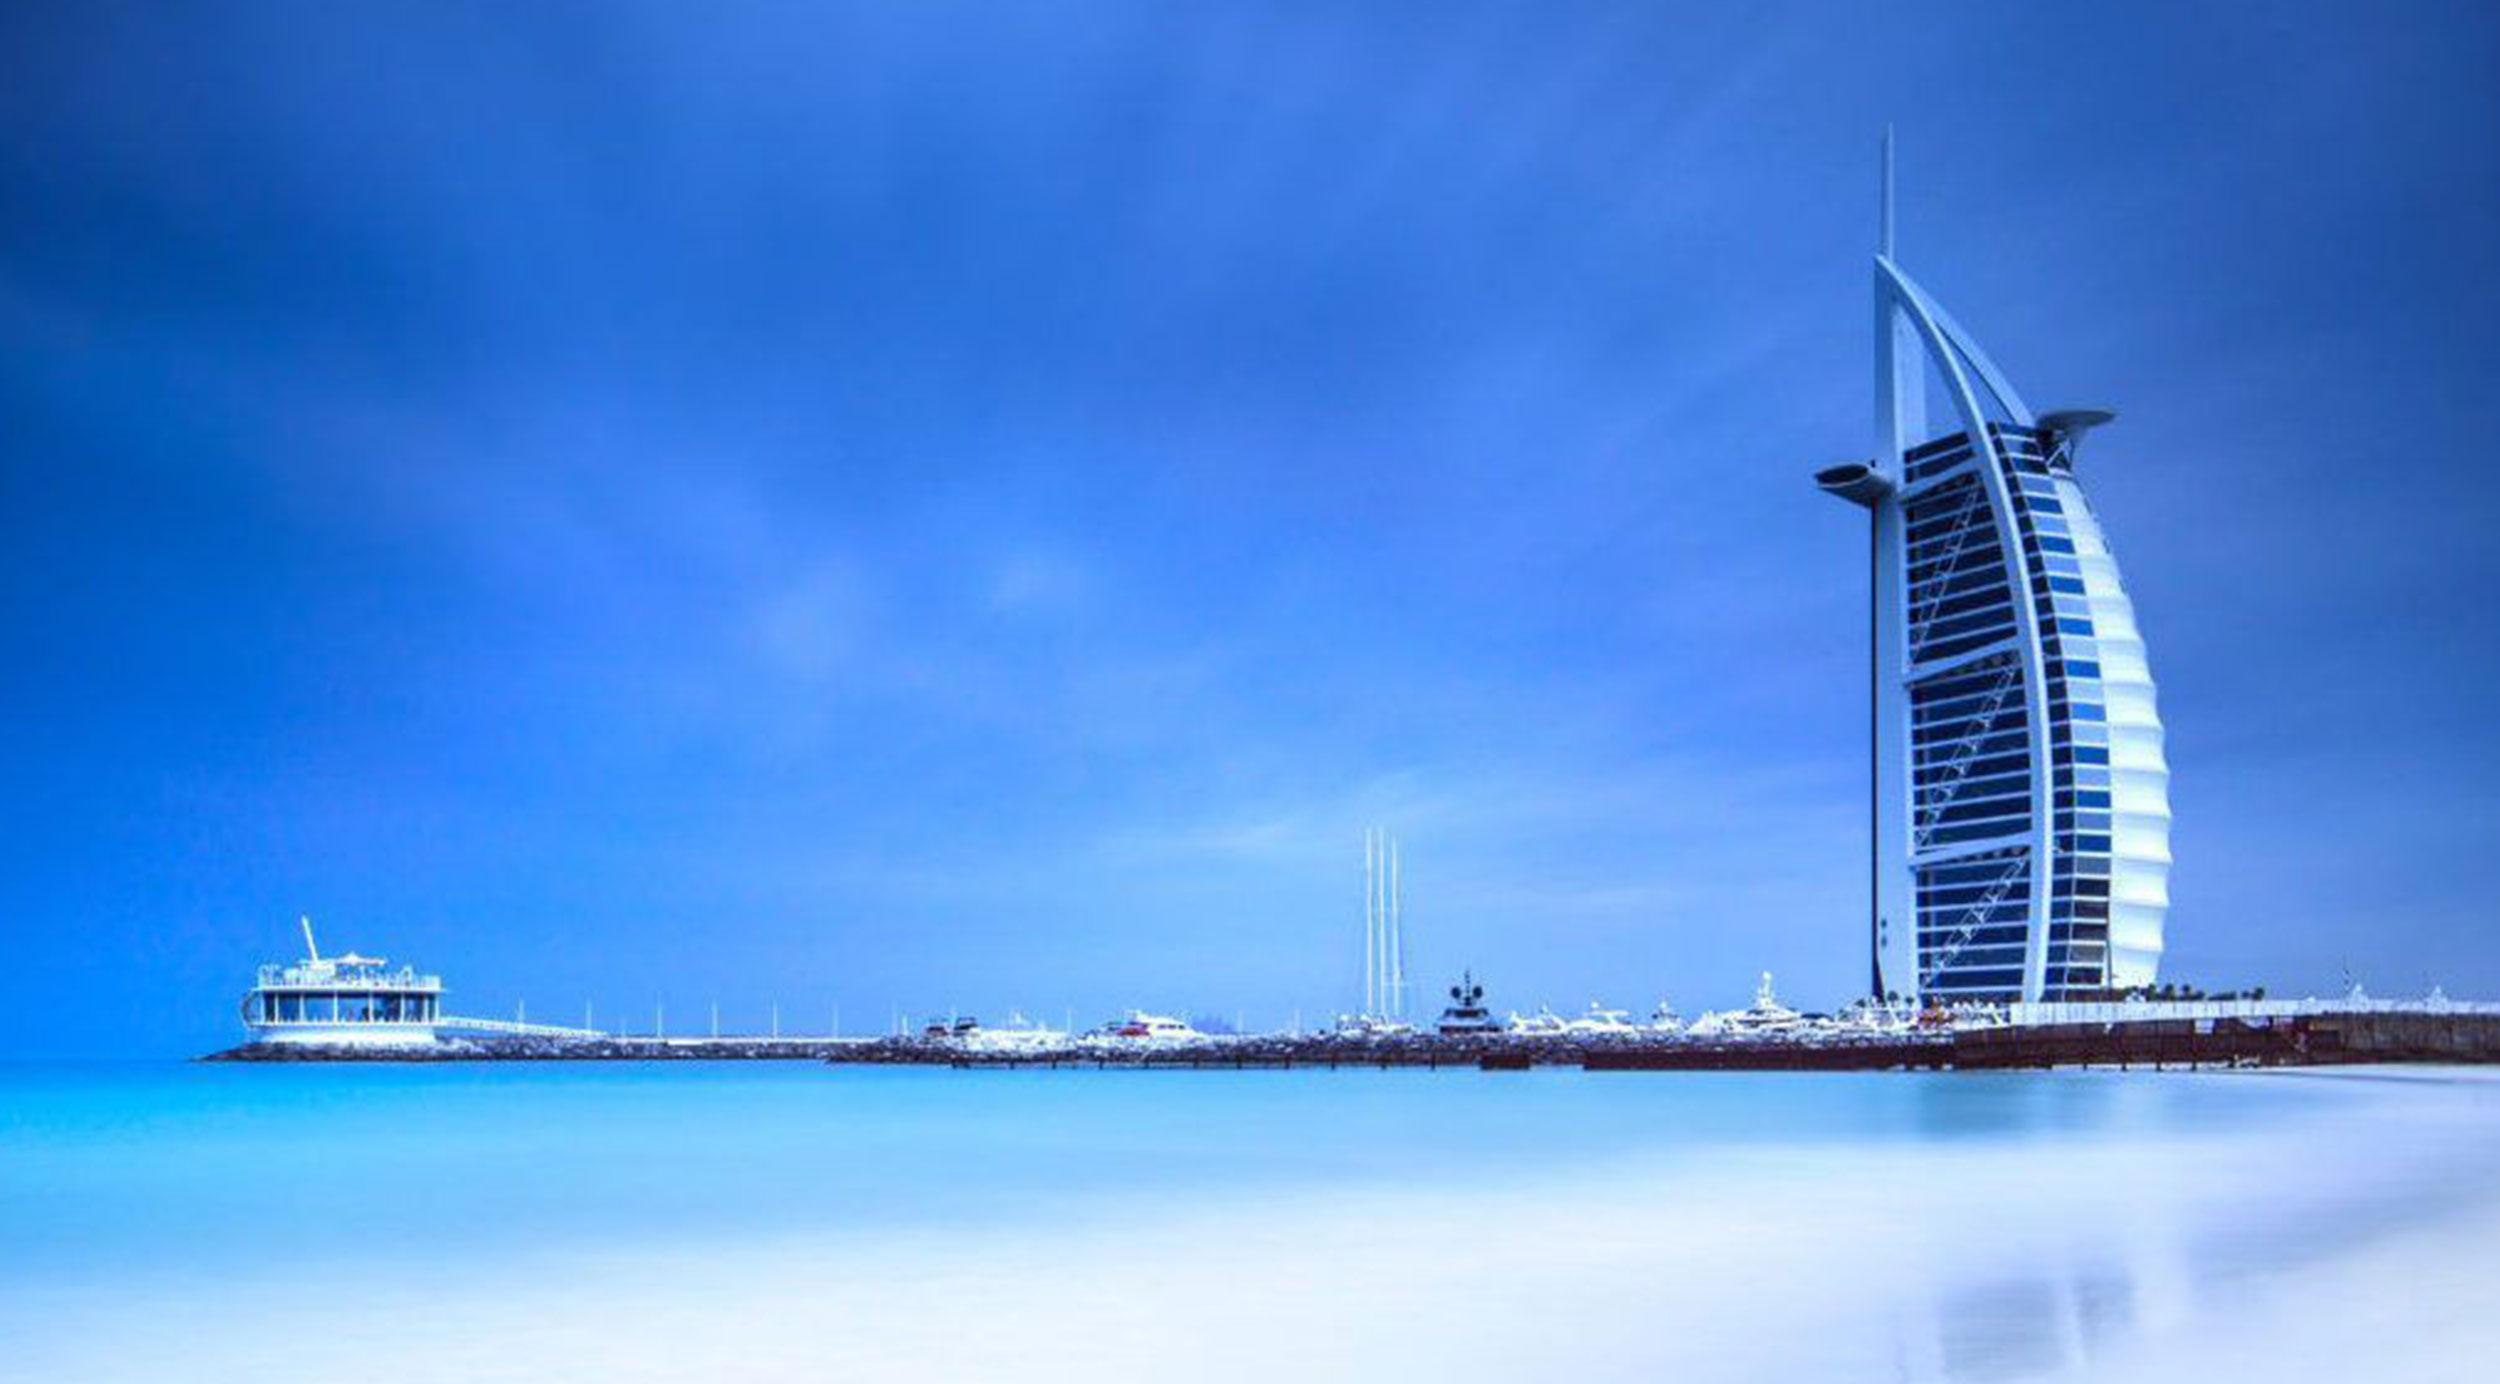 Projekt Webdesign München - Travel Service Dubai